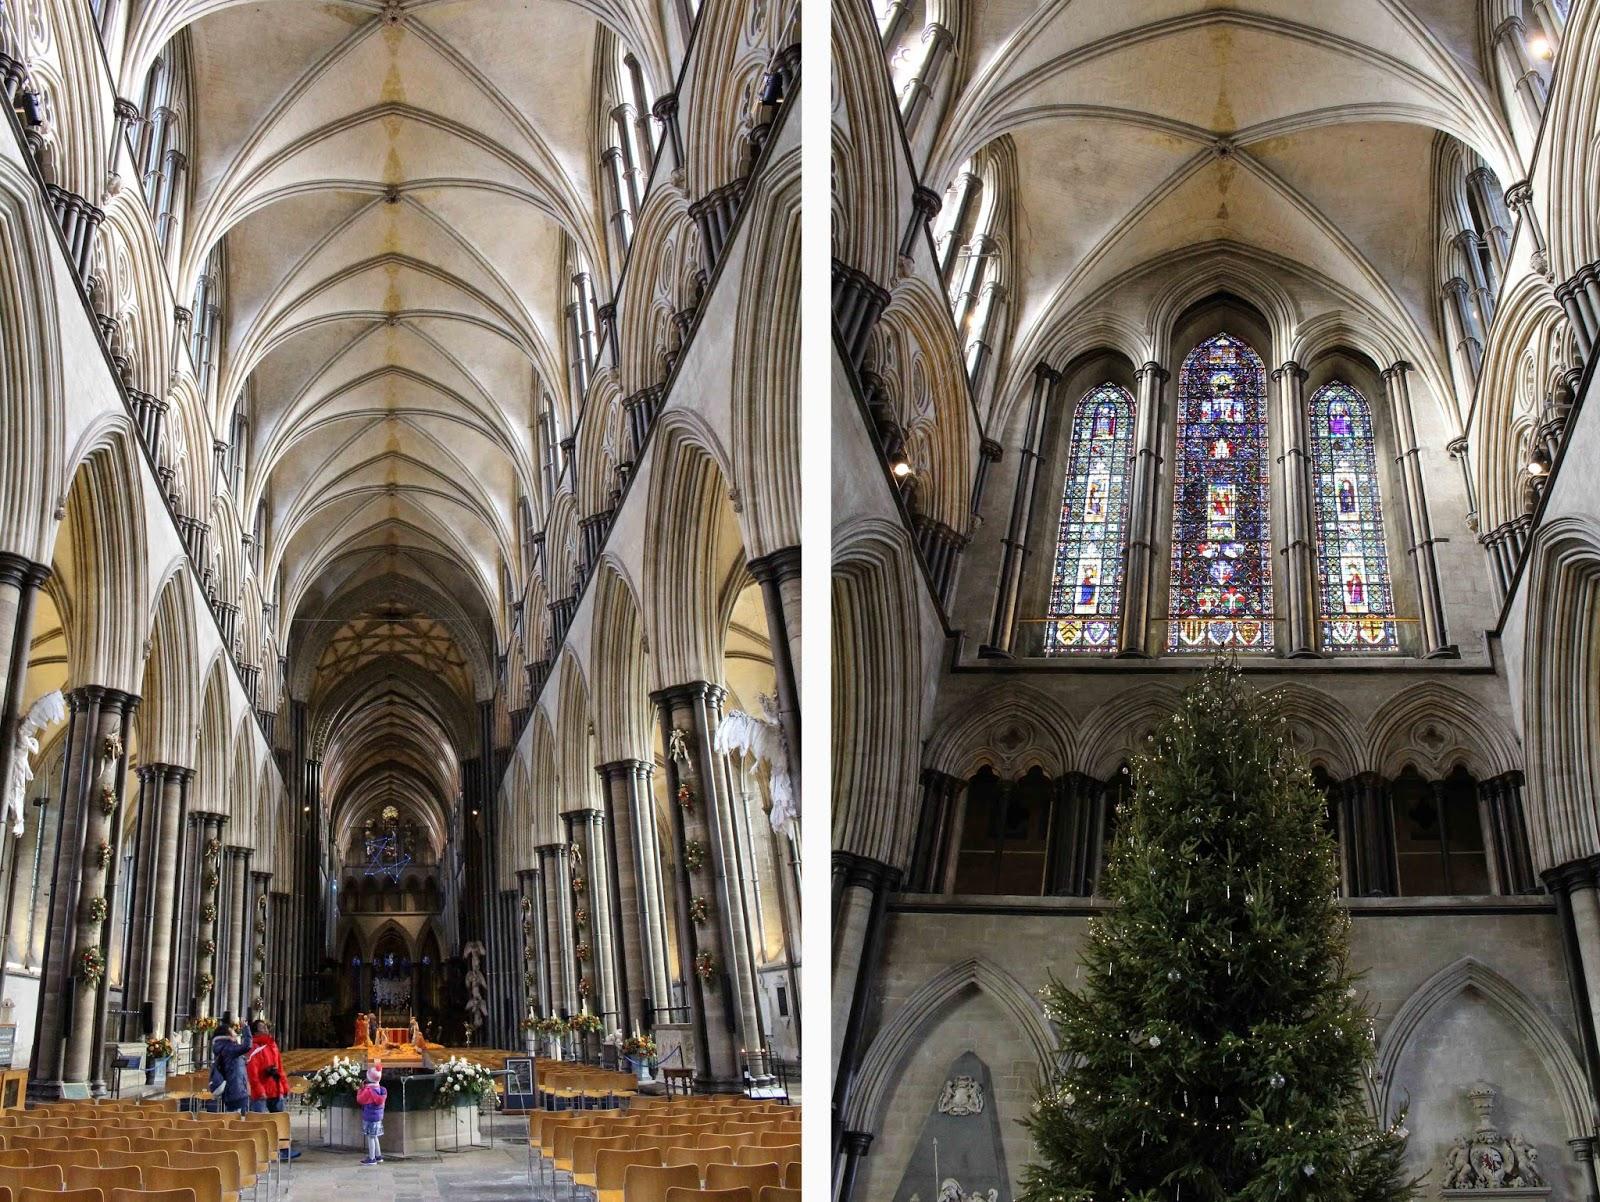 salisbury cathedral - photo #26